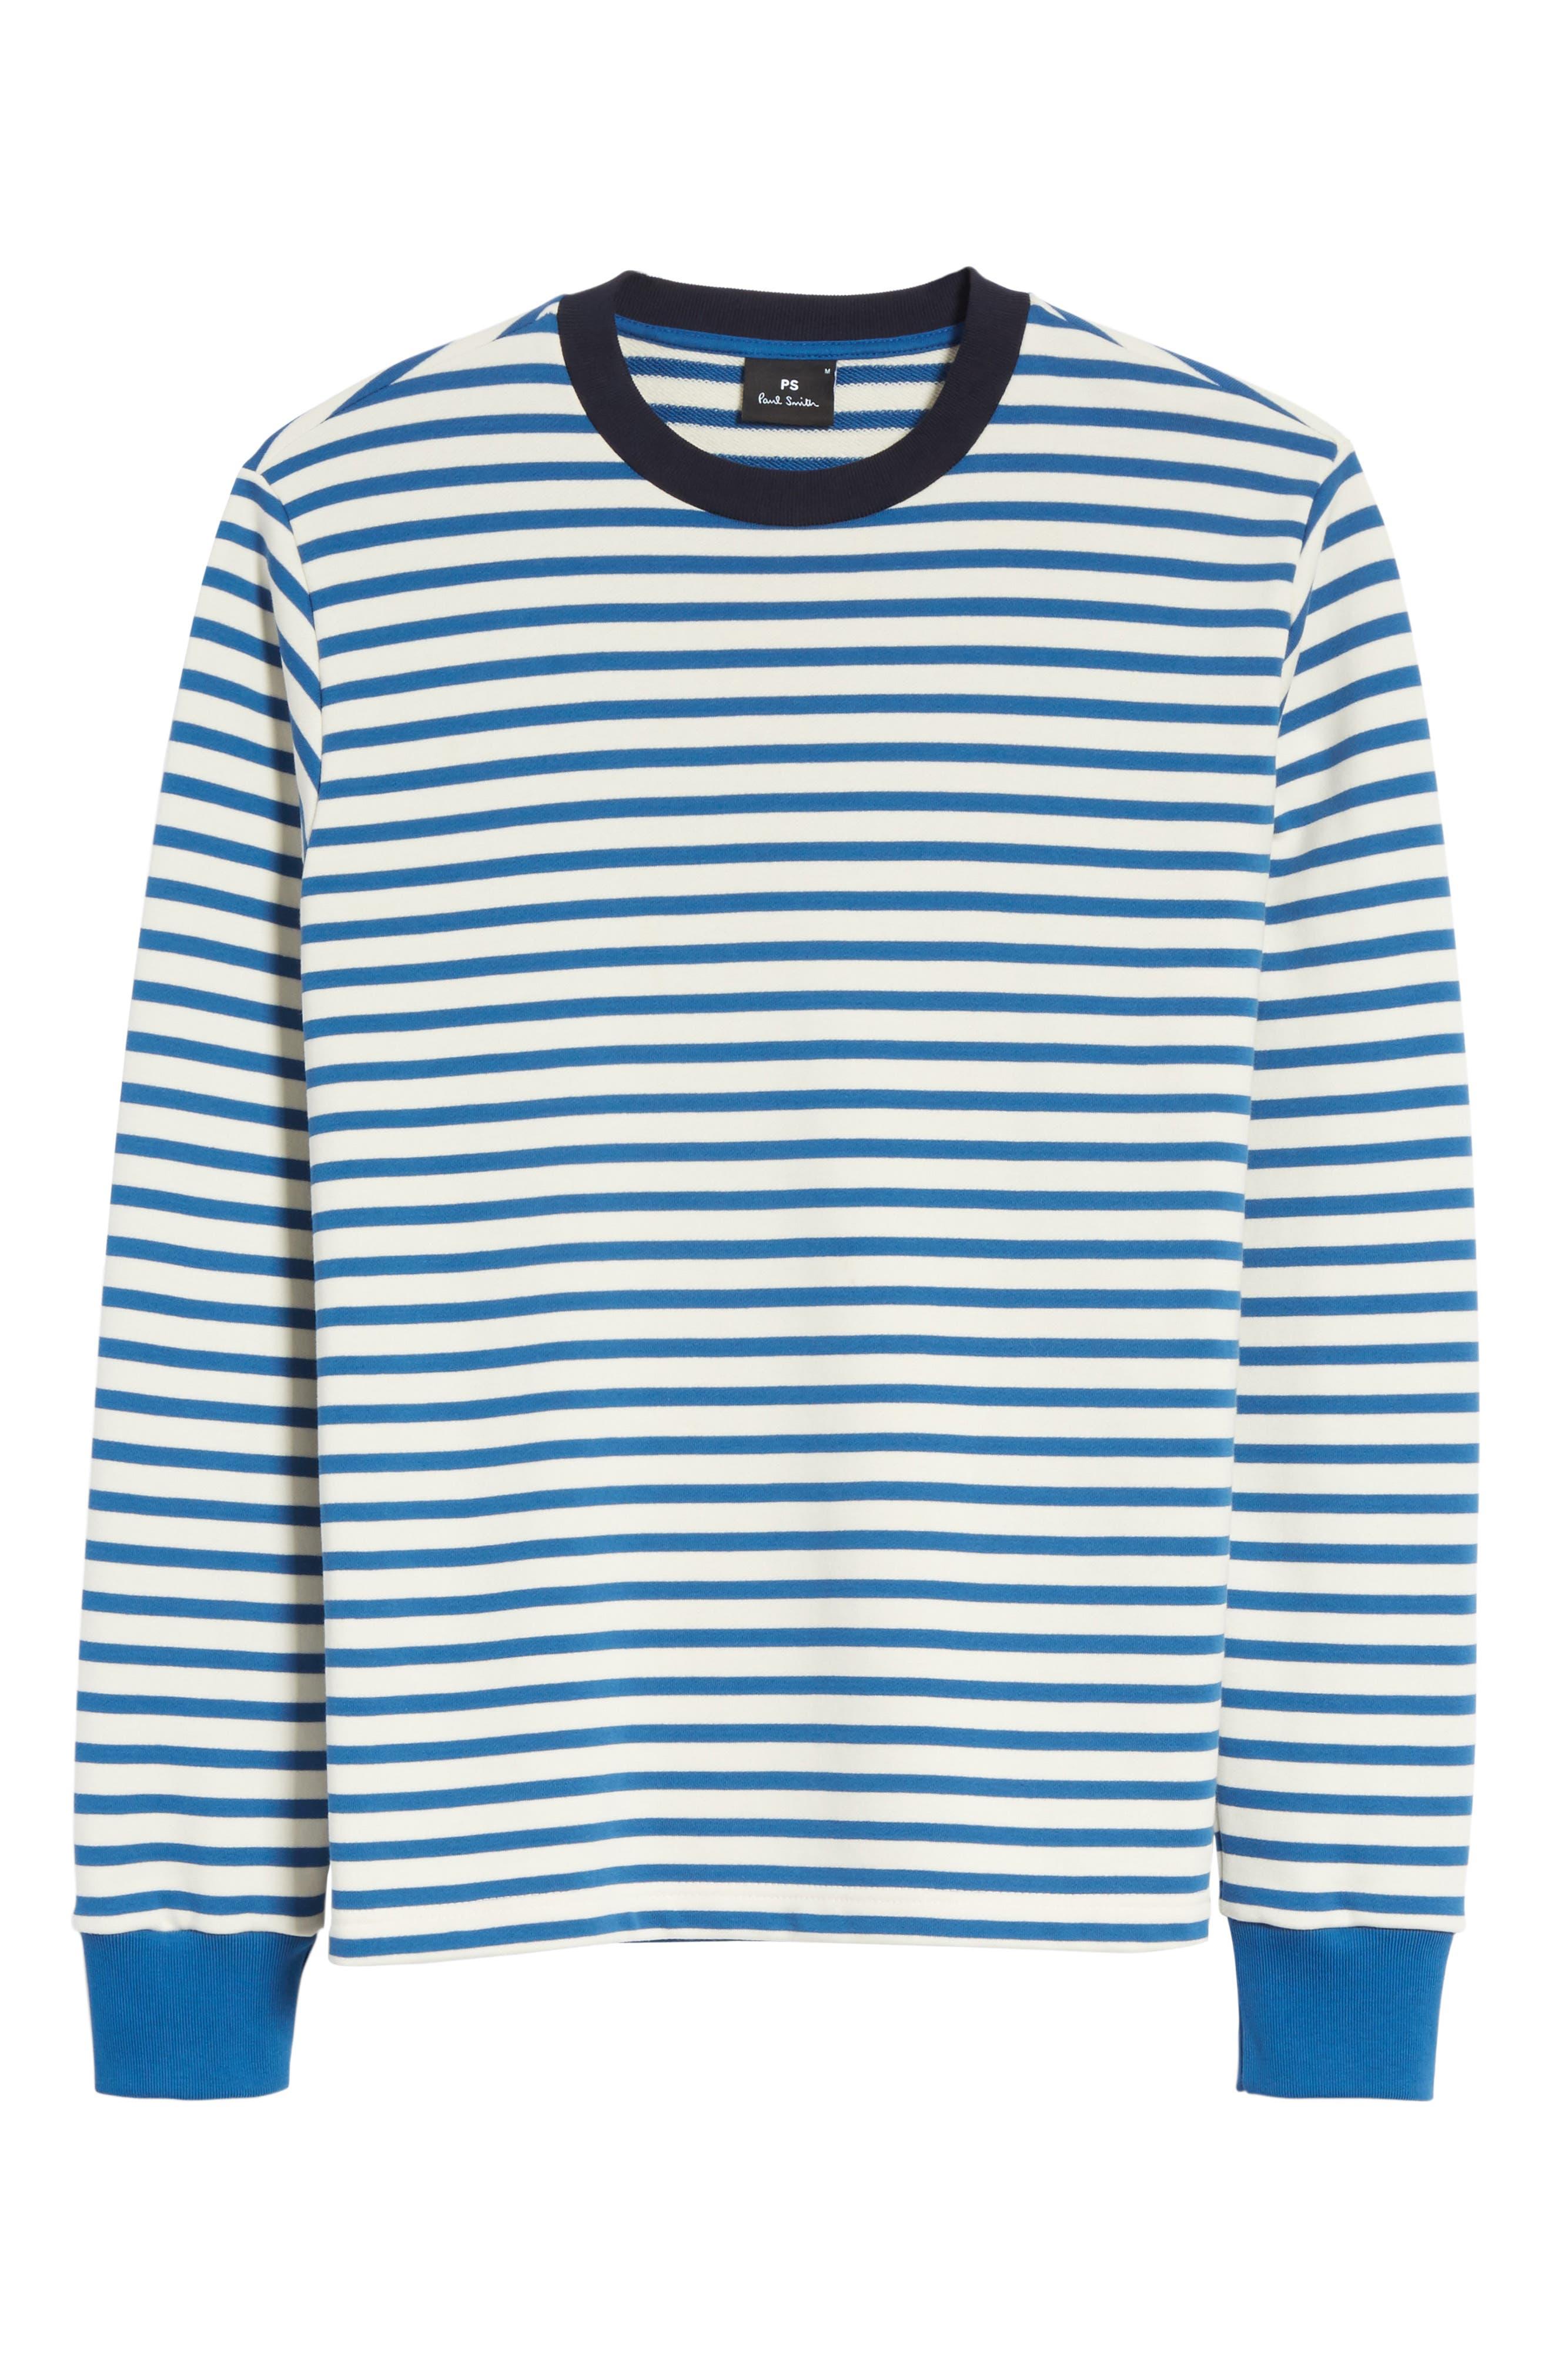 Stripe Crewneck Sweatshirt,                             Alternate thumbnail 6, color,                             Indigo